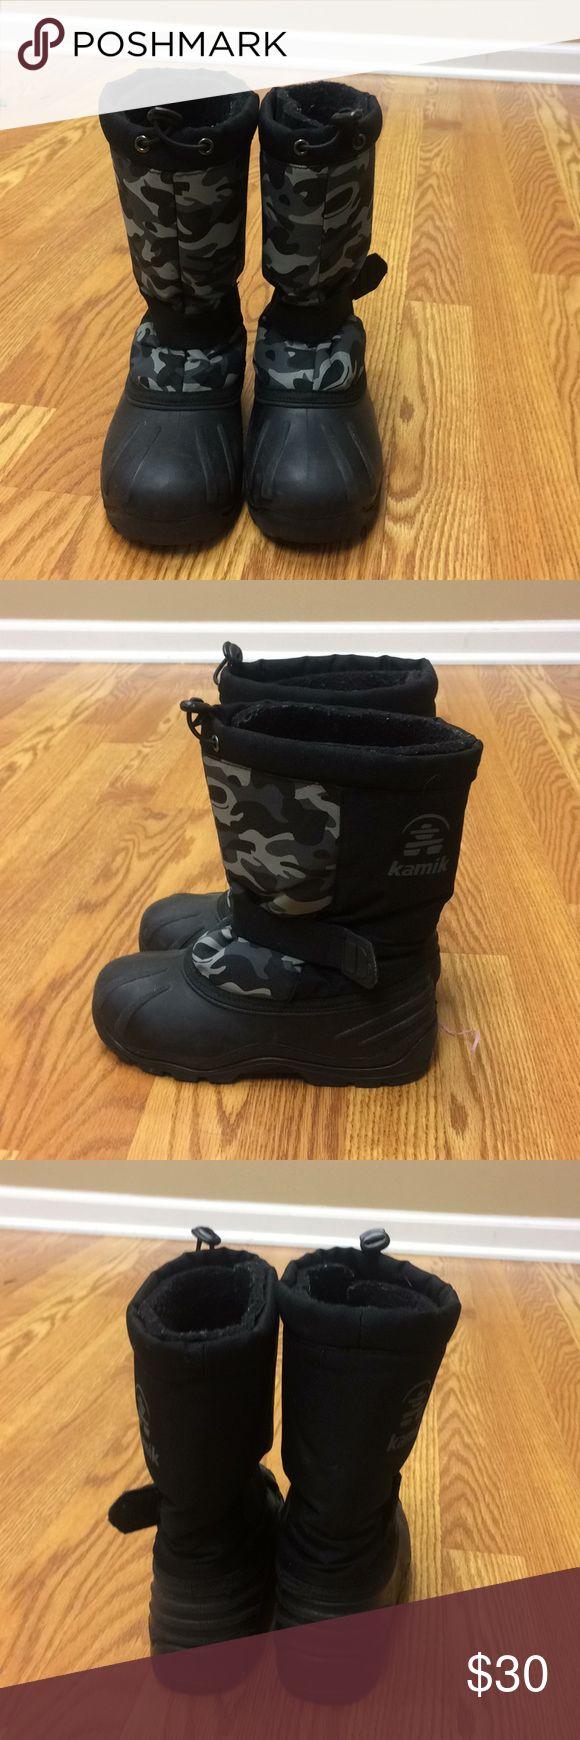 Boys winter boots Practically brand new Kamik winter boots! Kamik Shoes Rain & Snow Boots